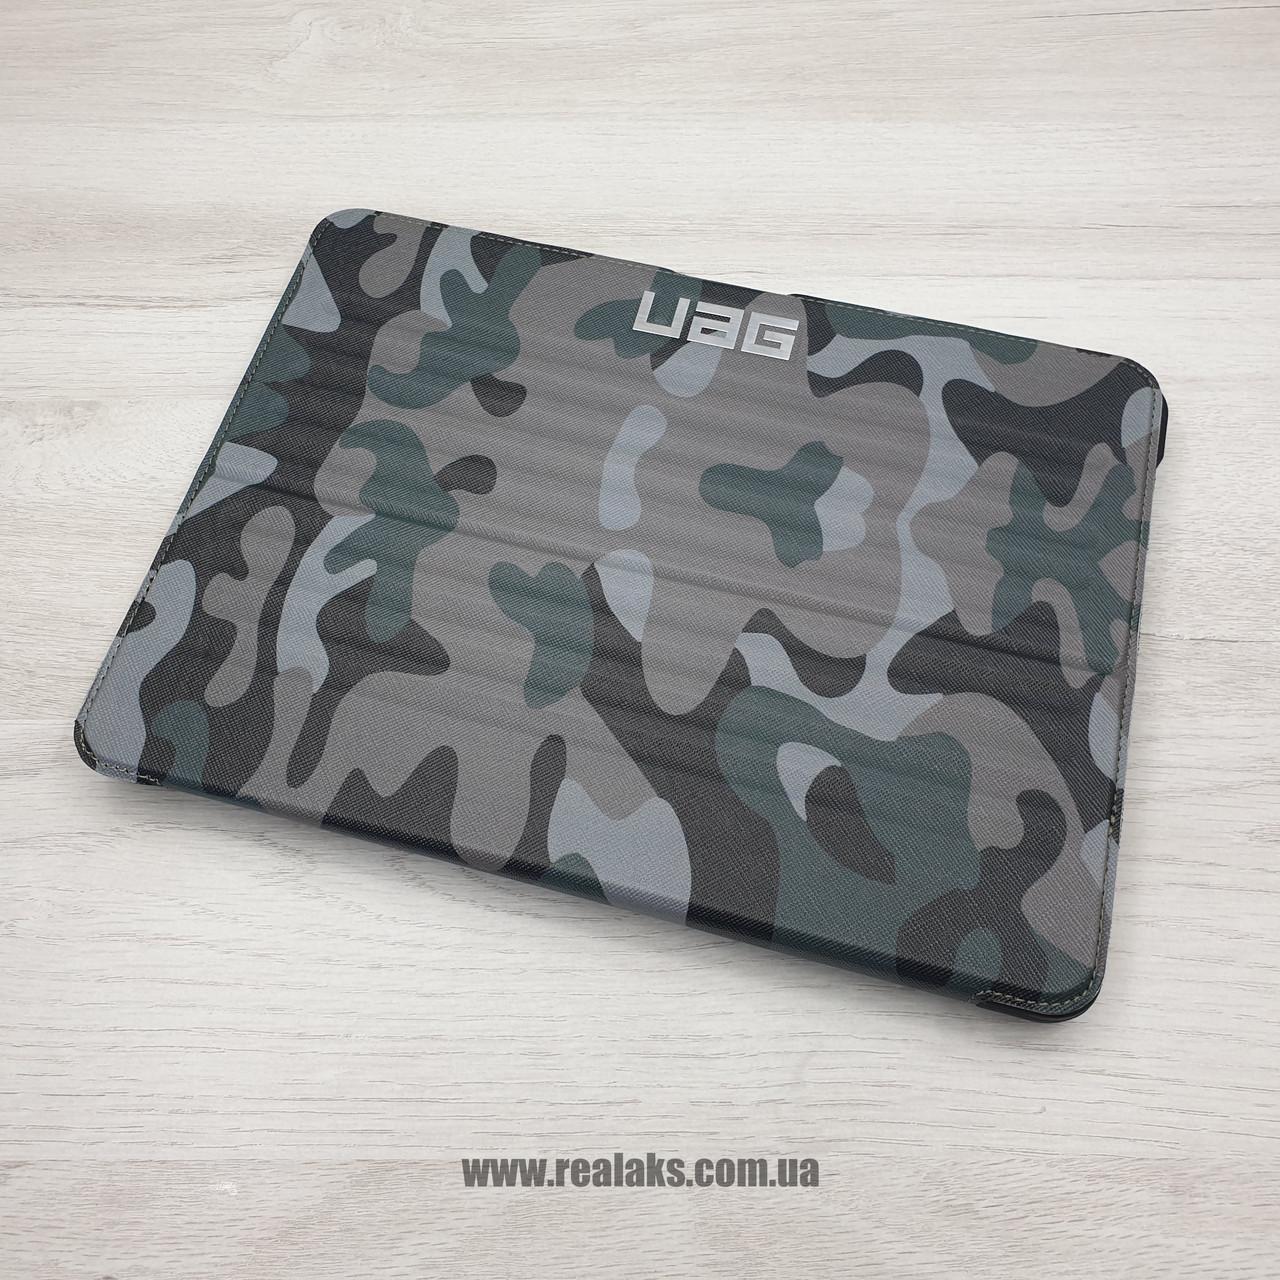 Чехол противоударный UAG для iPad new 10.2 green/black